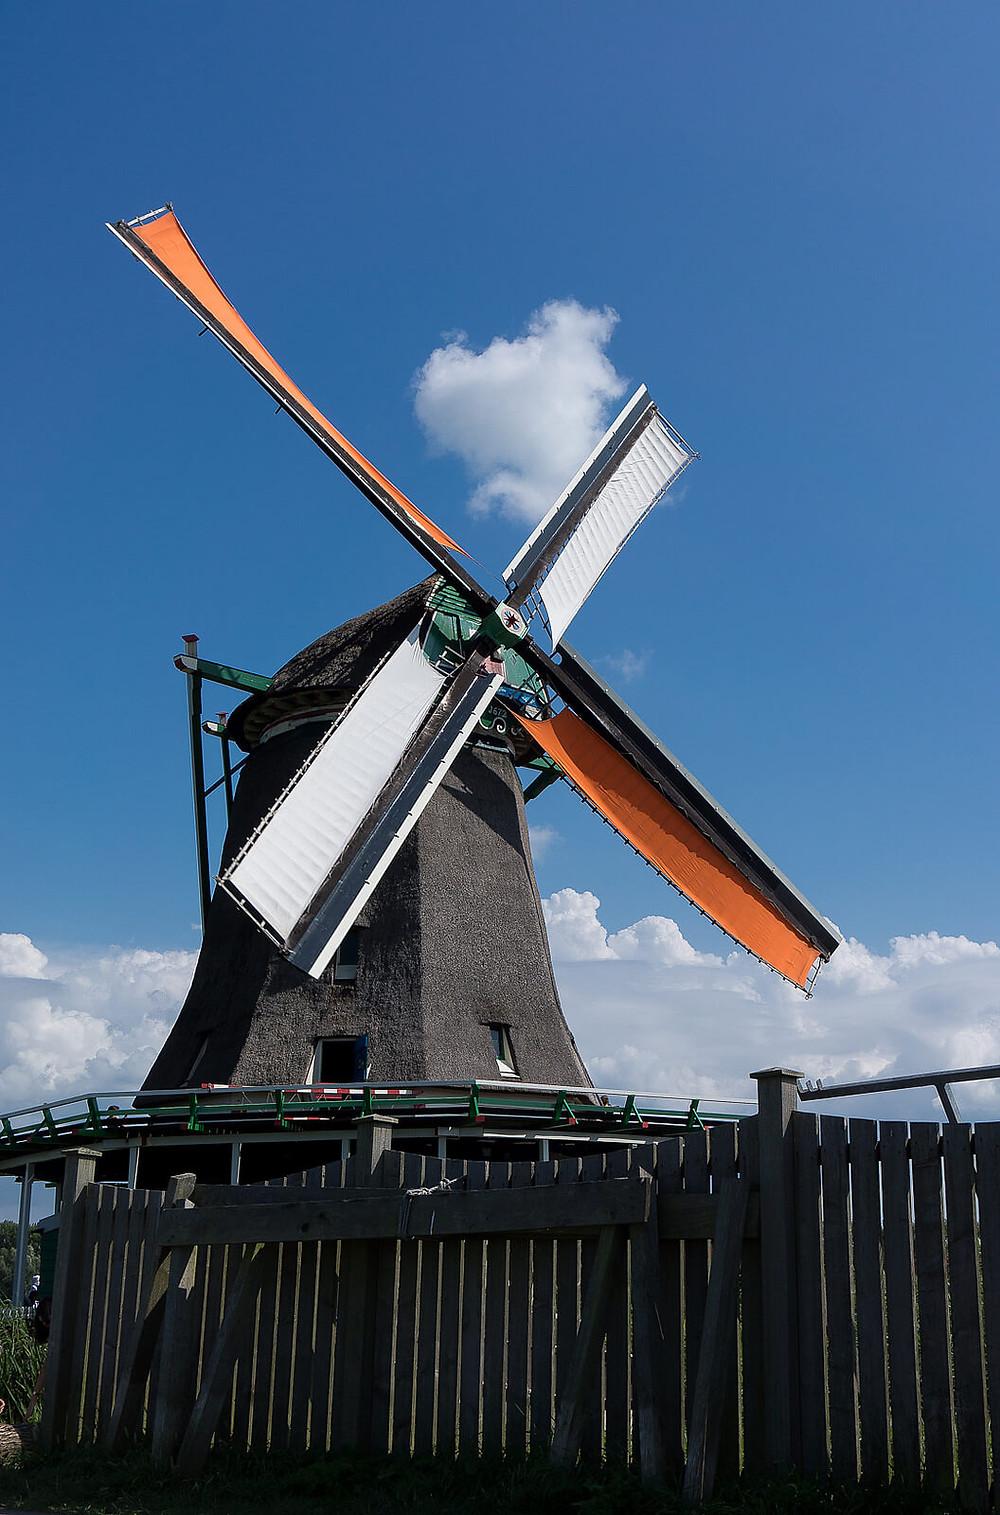 Windmill in the Zaanse Schans area - Beejonson